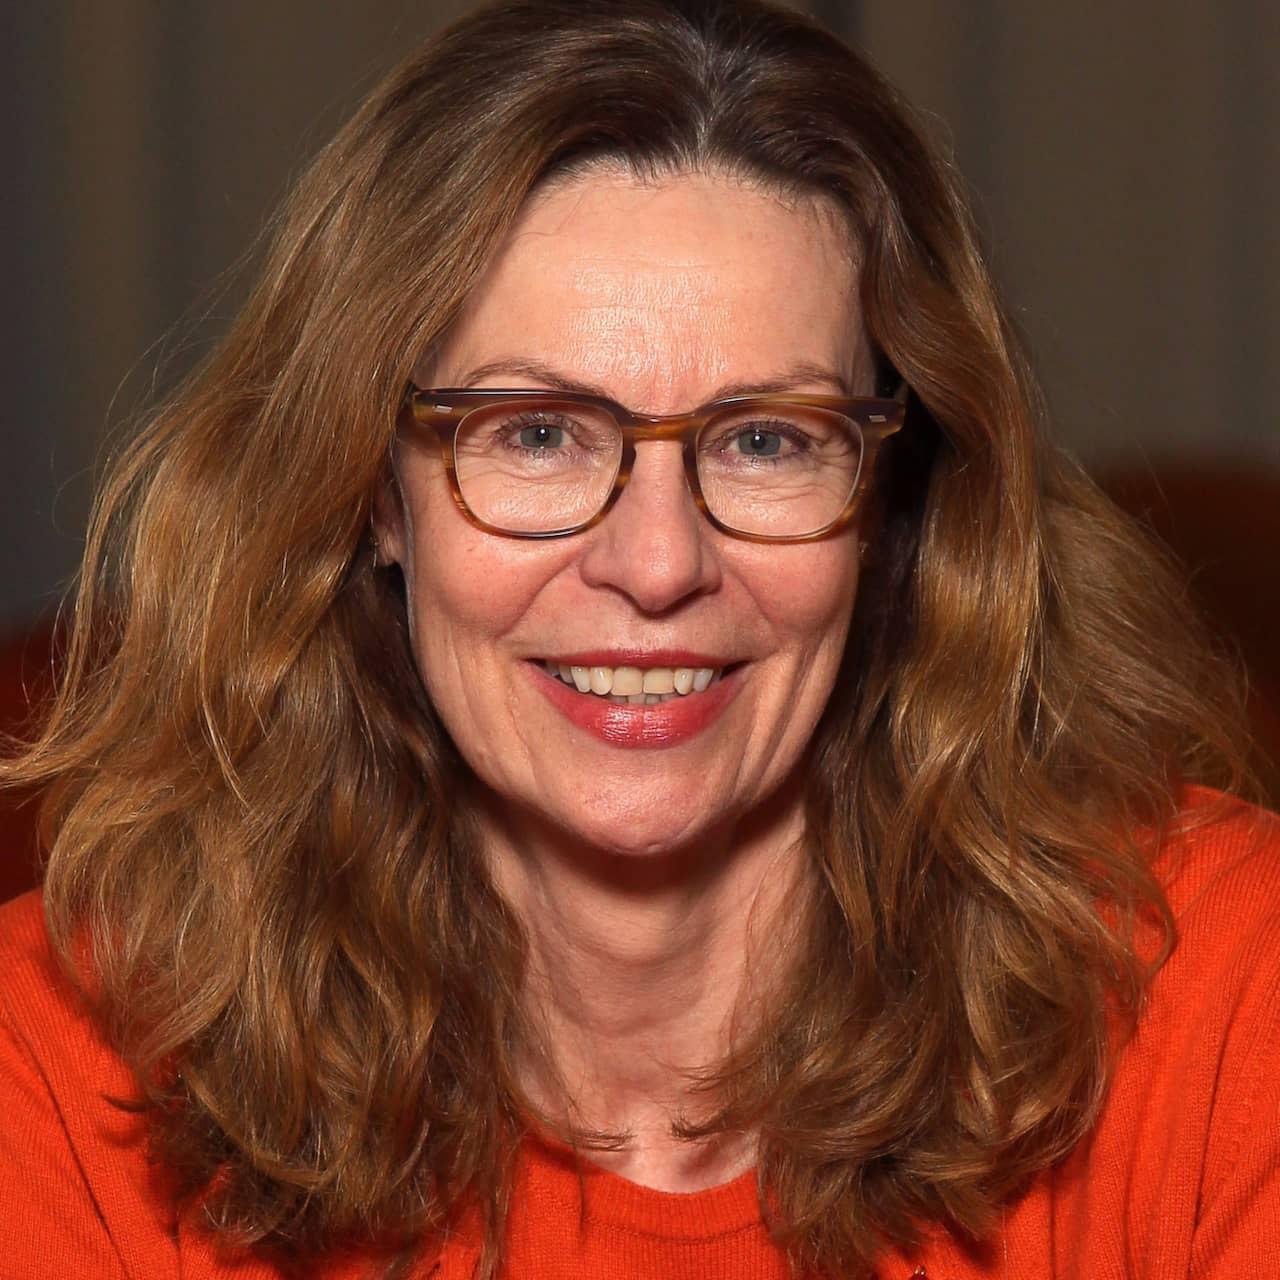 20. Birgitte Bonnesen